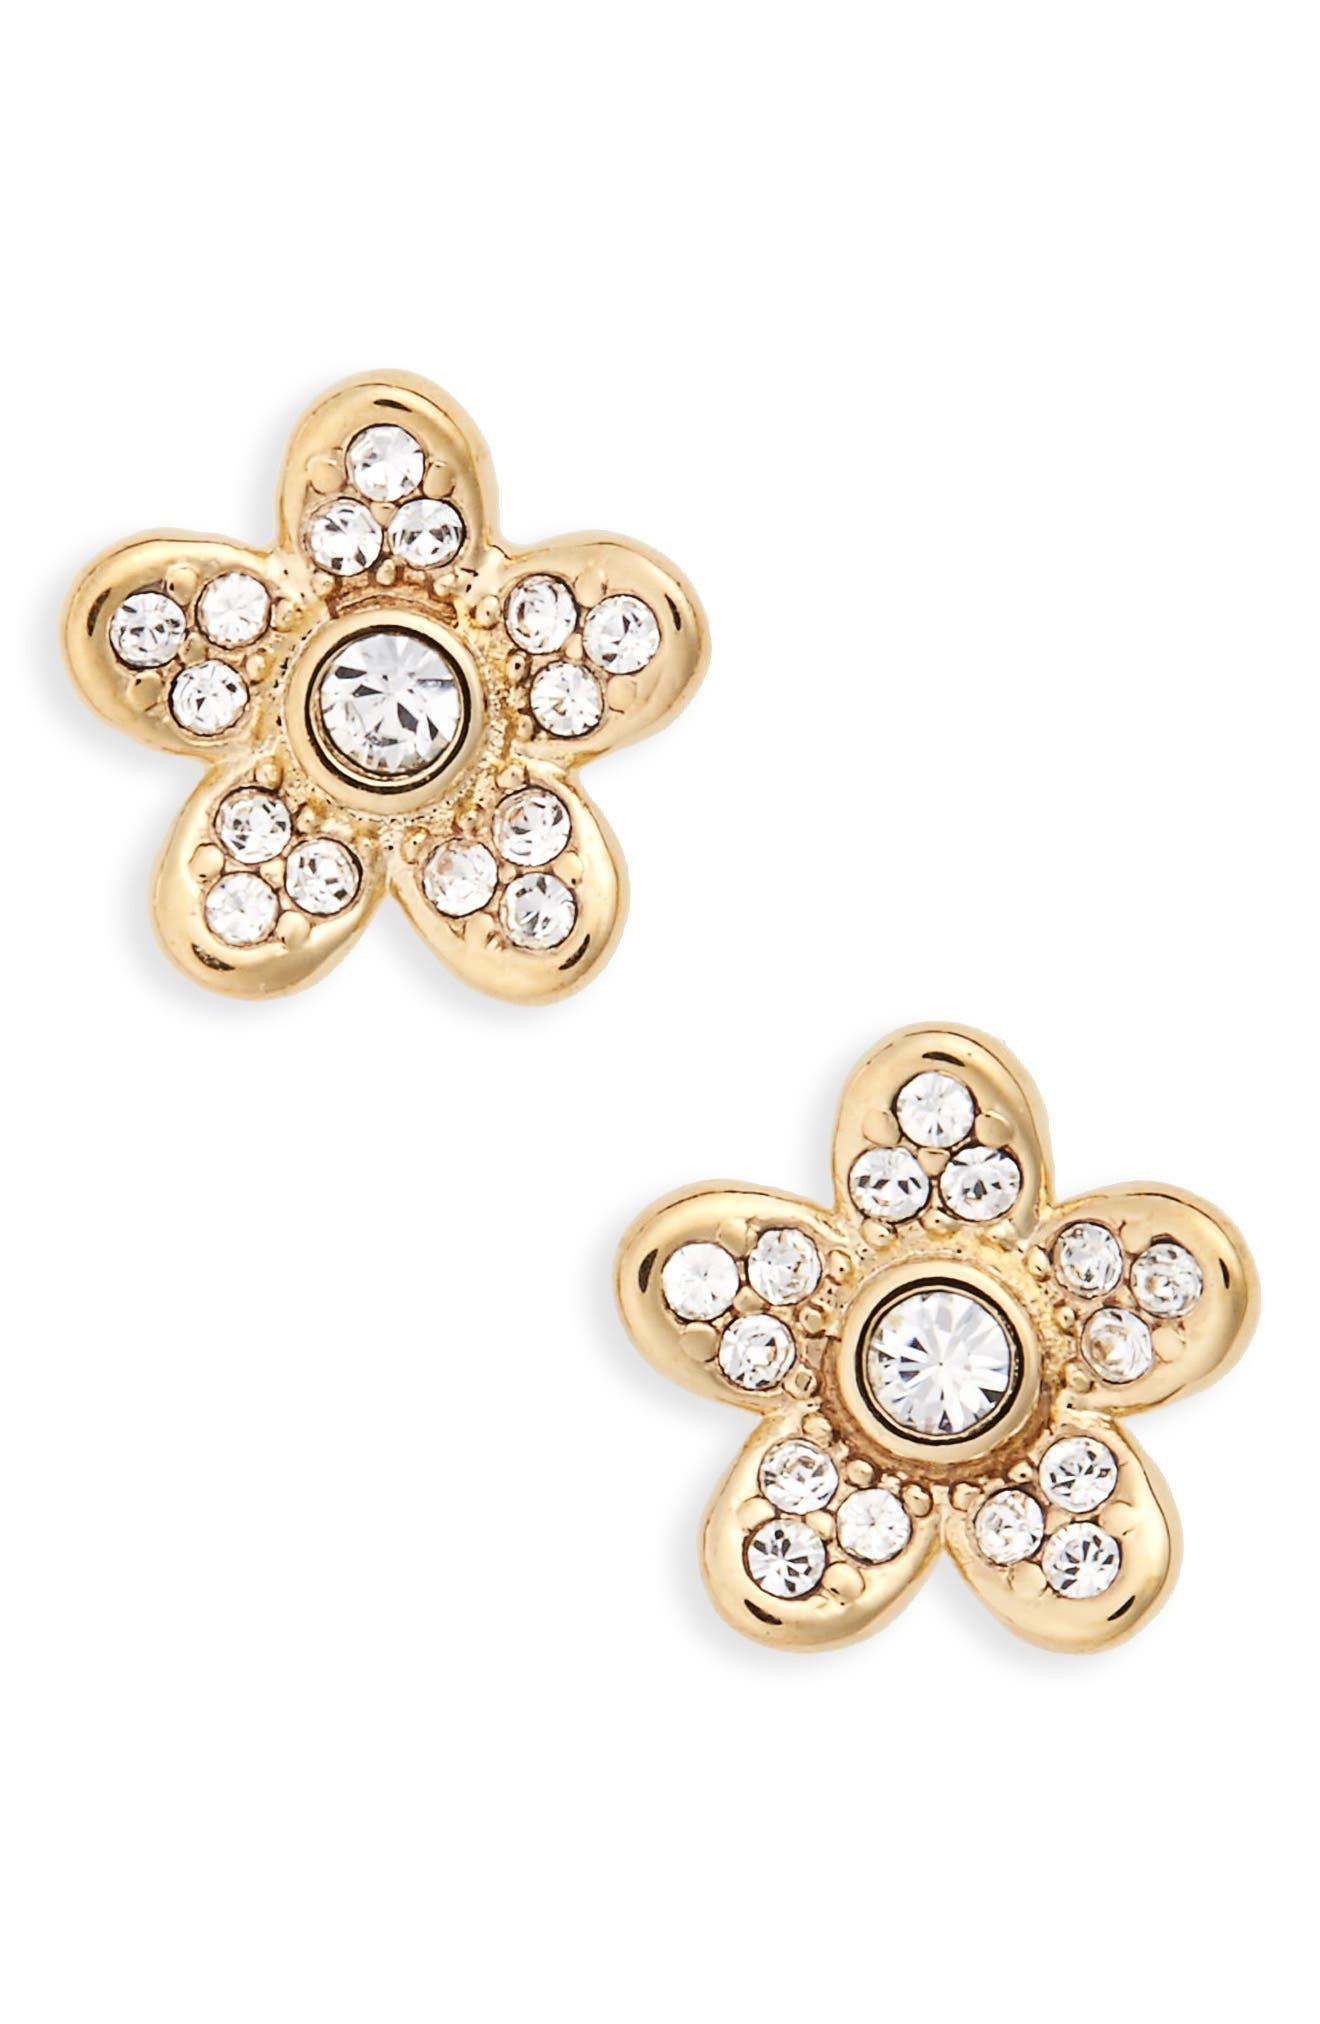 MARC JACOBS Coin Flower Stud Earrings